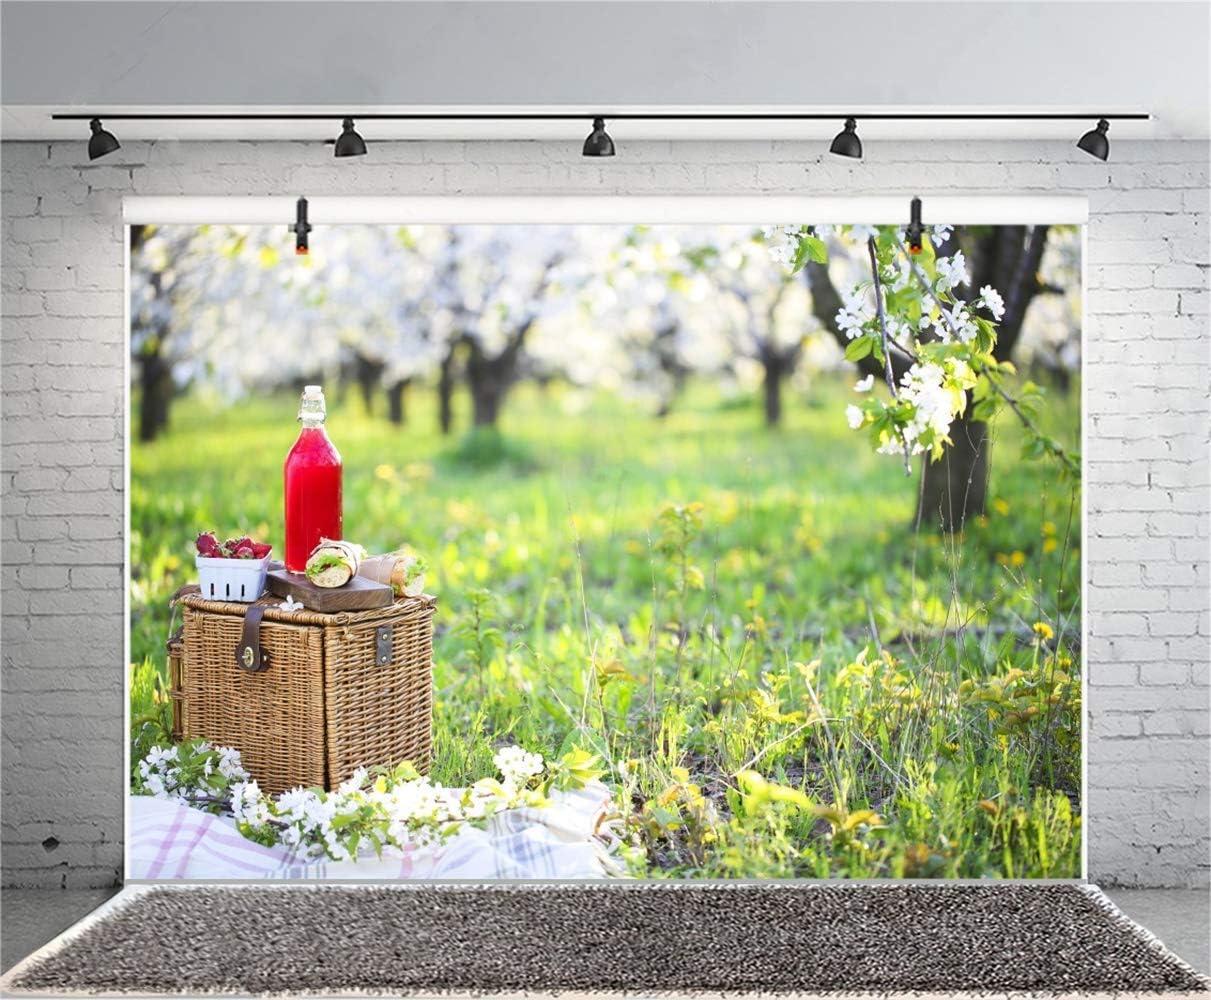 10x6.5ft Blossoming Gardon Picnic Polyester Photography Backdrop Spring Scenic Background Basket Sandwiches Juice Strawberry White Flowers Green Grassland Wedding Photo Studio Prop